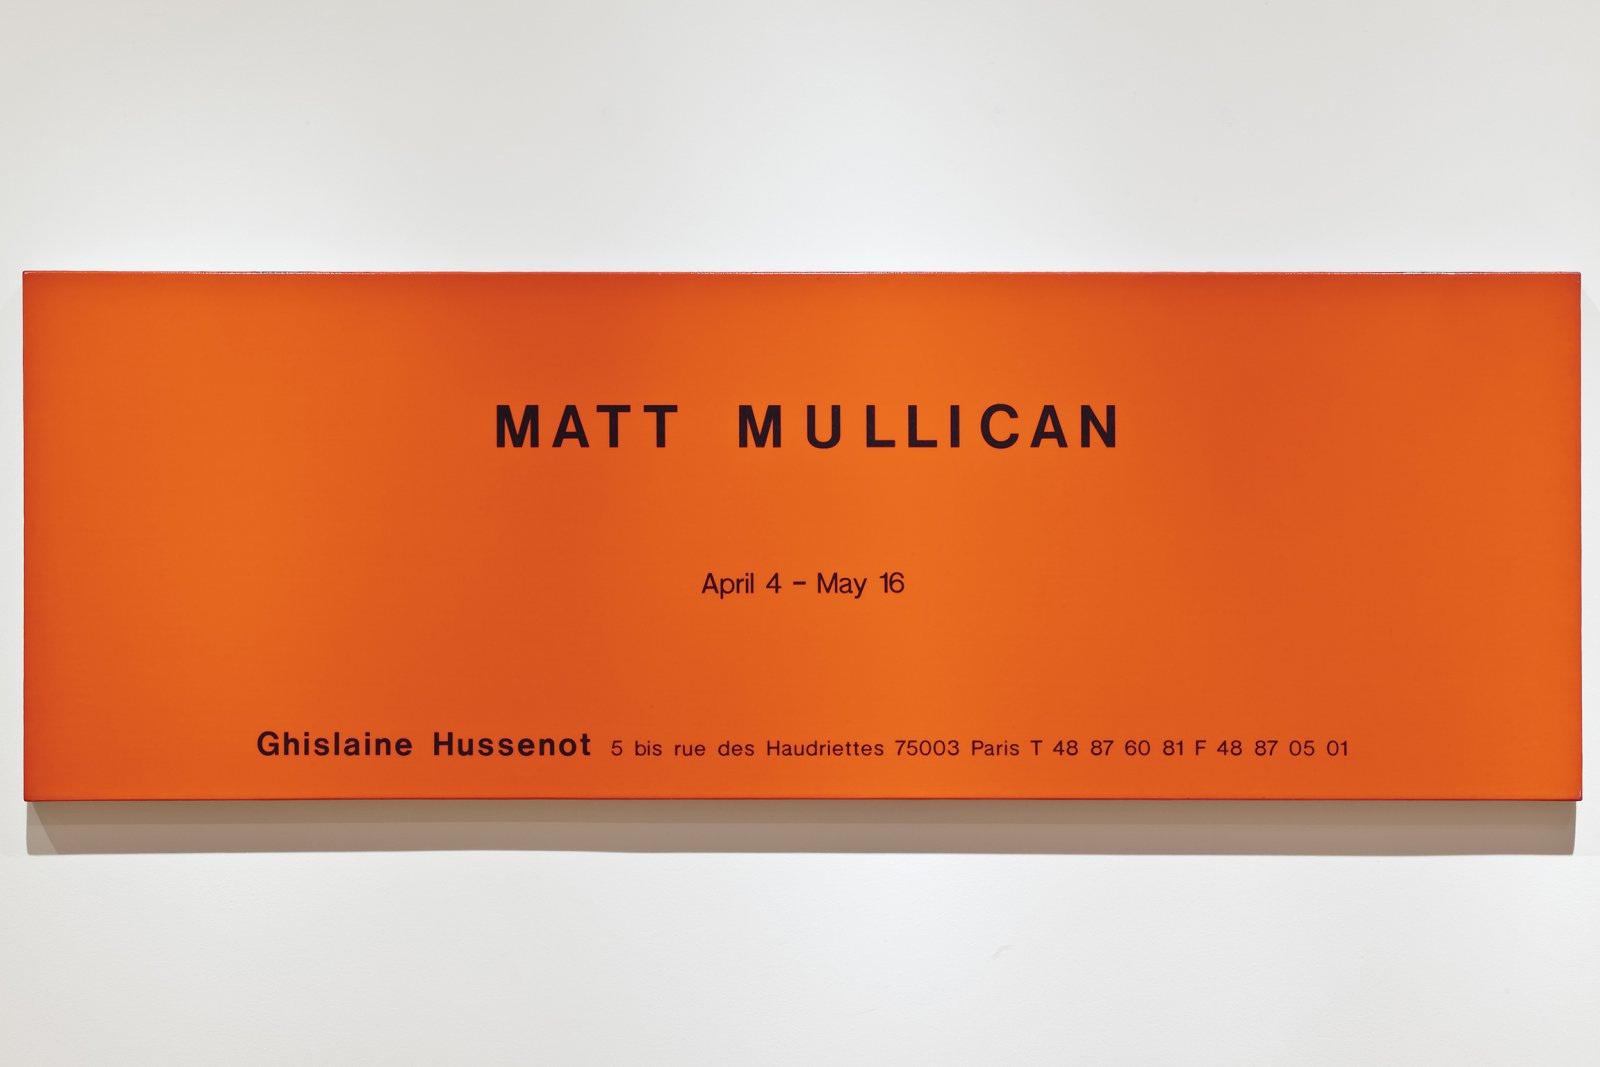 Ron Terada,Untitled (Ad Painting: MattMullican), 1994, acrylic on linen, 24 x 72 in. (61 x 183 cm)